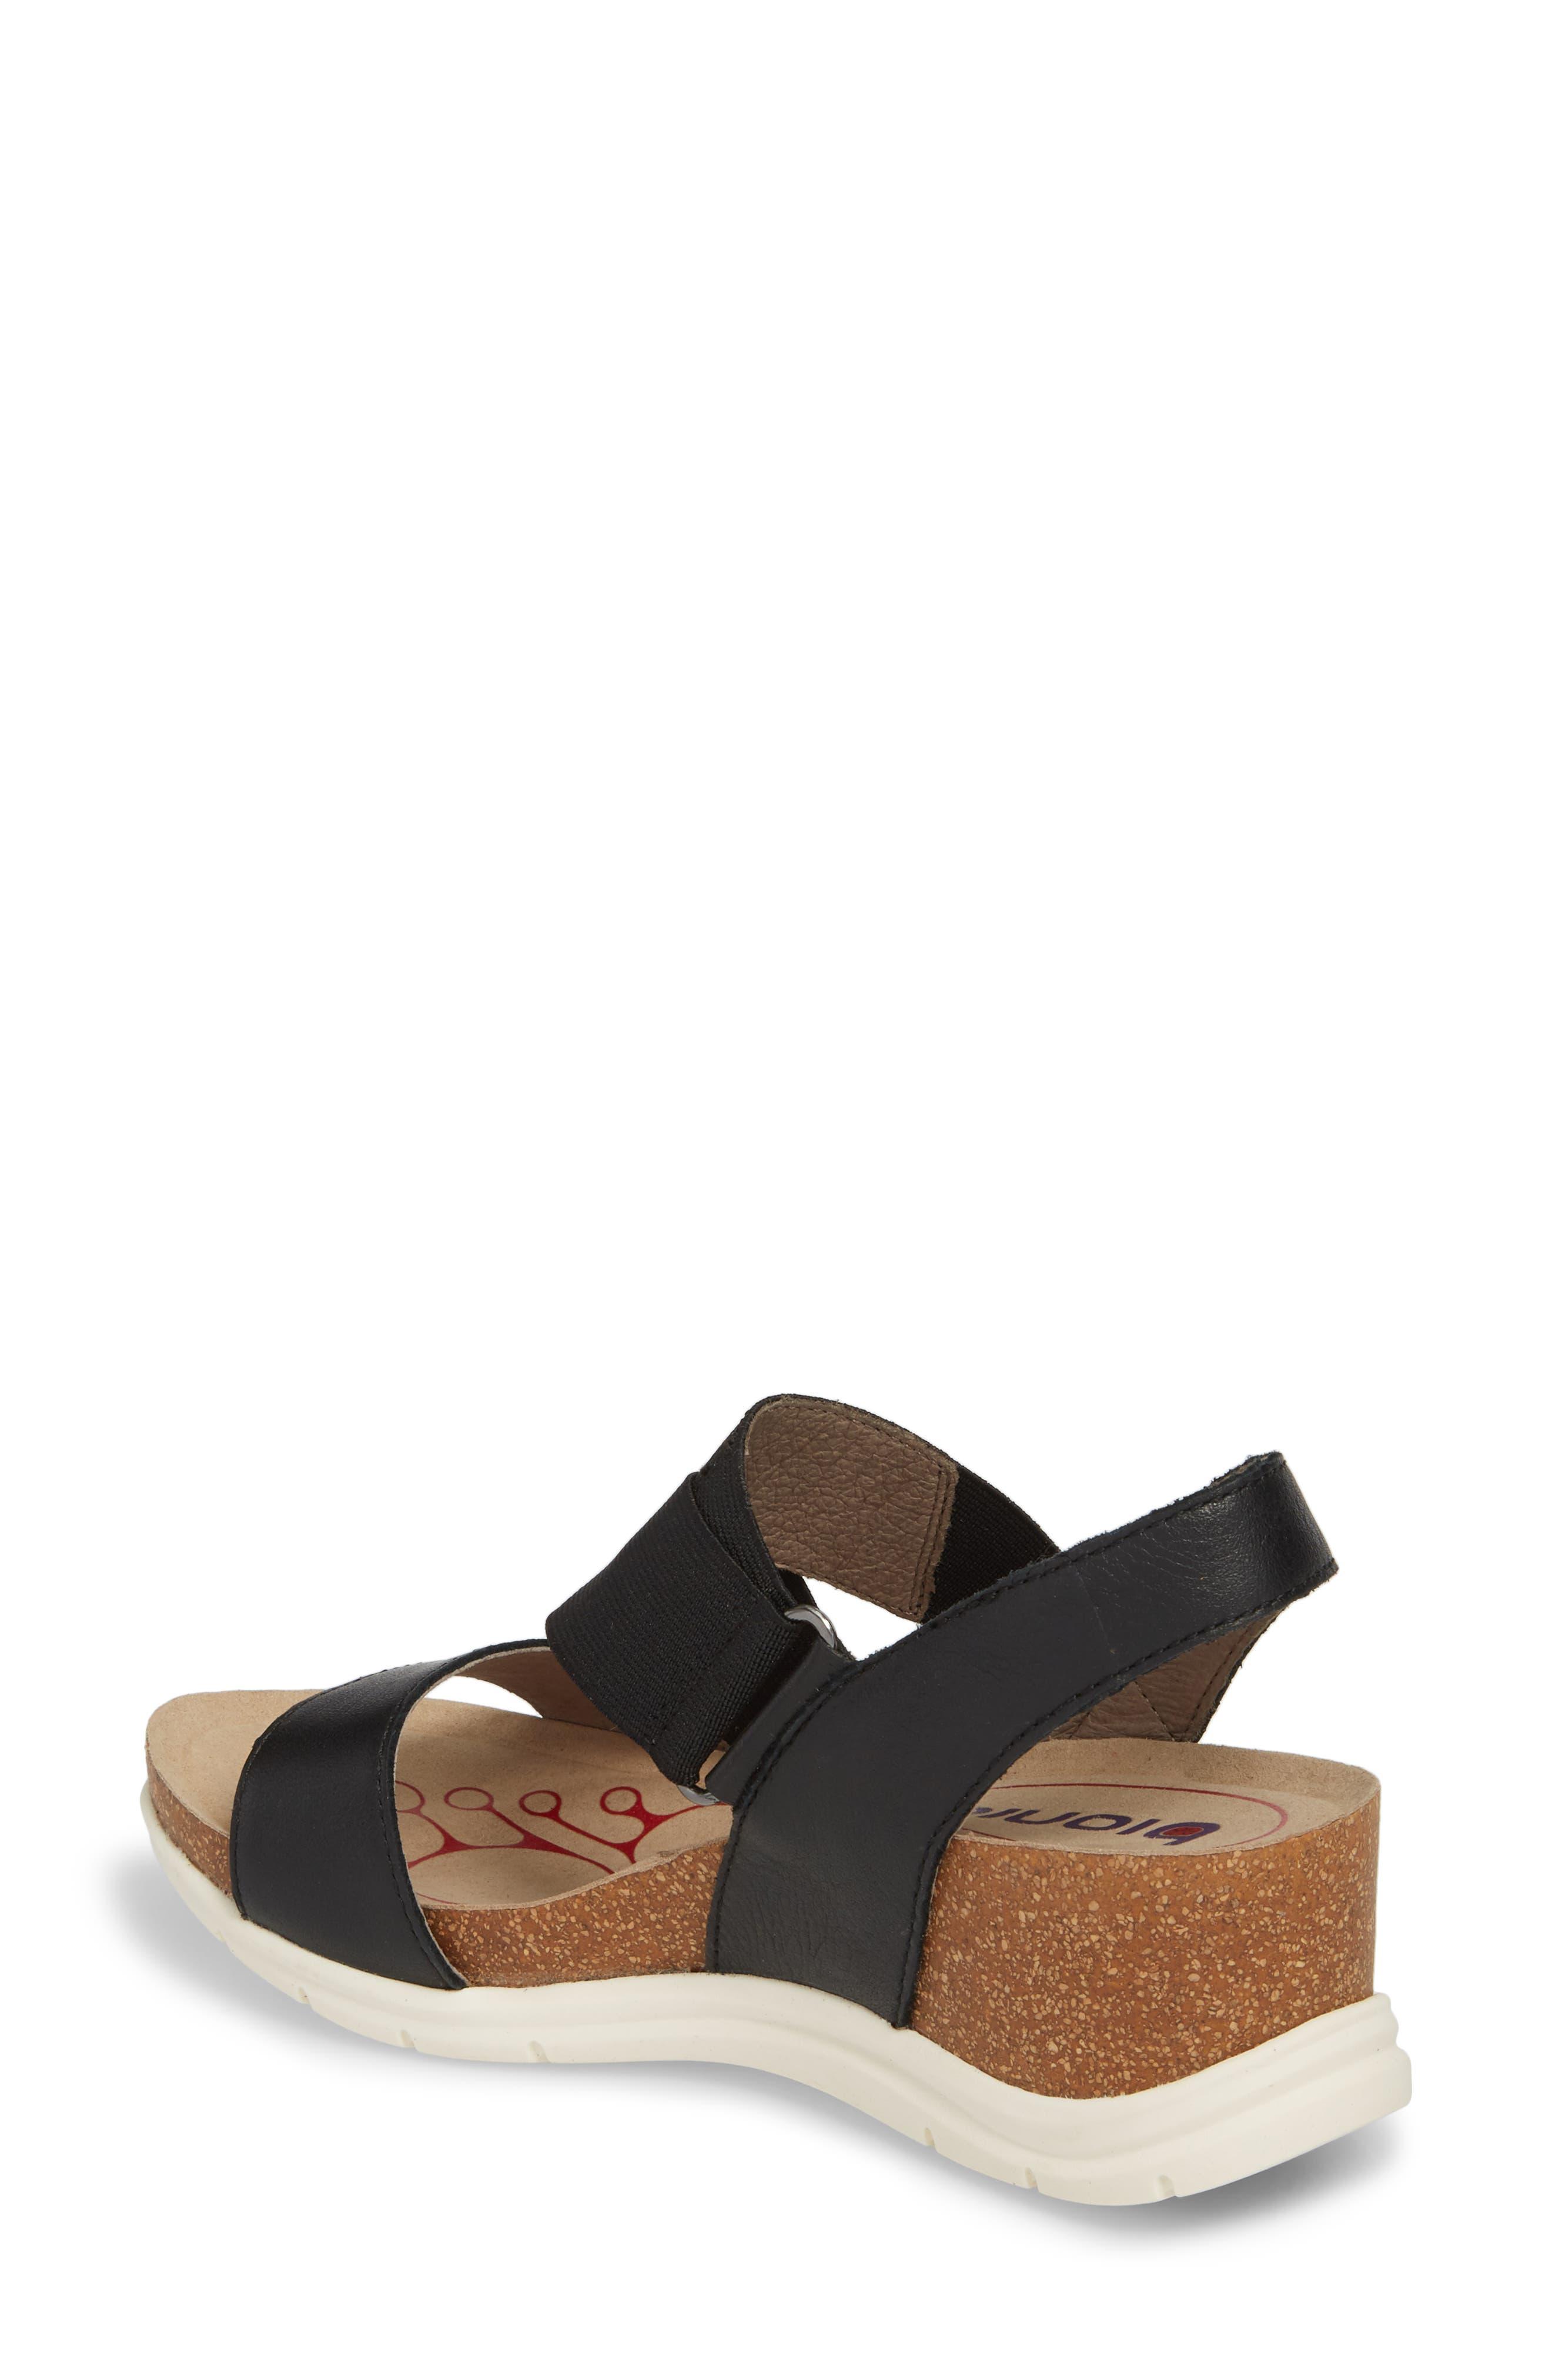 Paisley Wedge Sandal,                             Alternate thumbnail 2, color,                             001